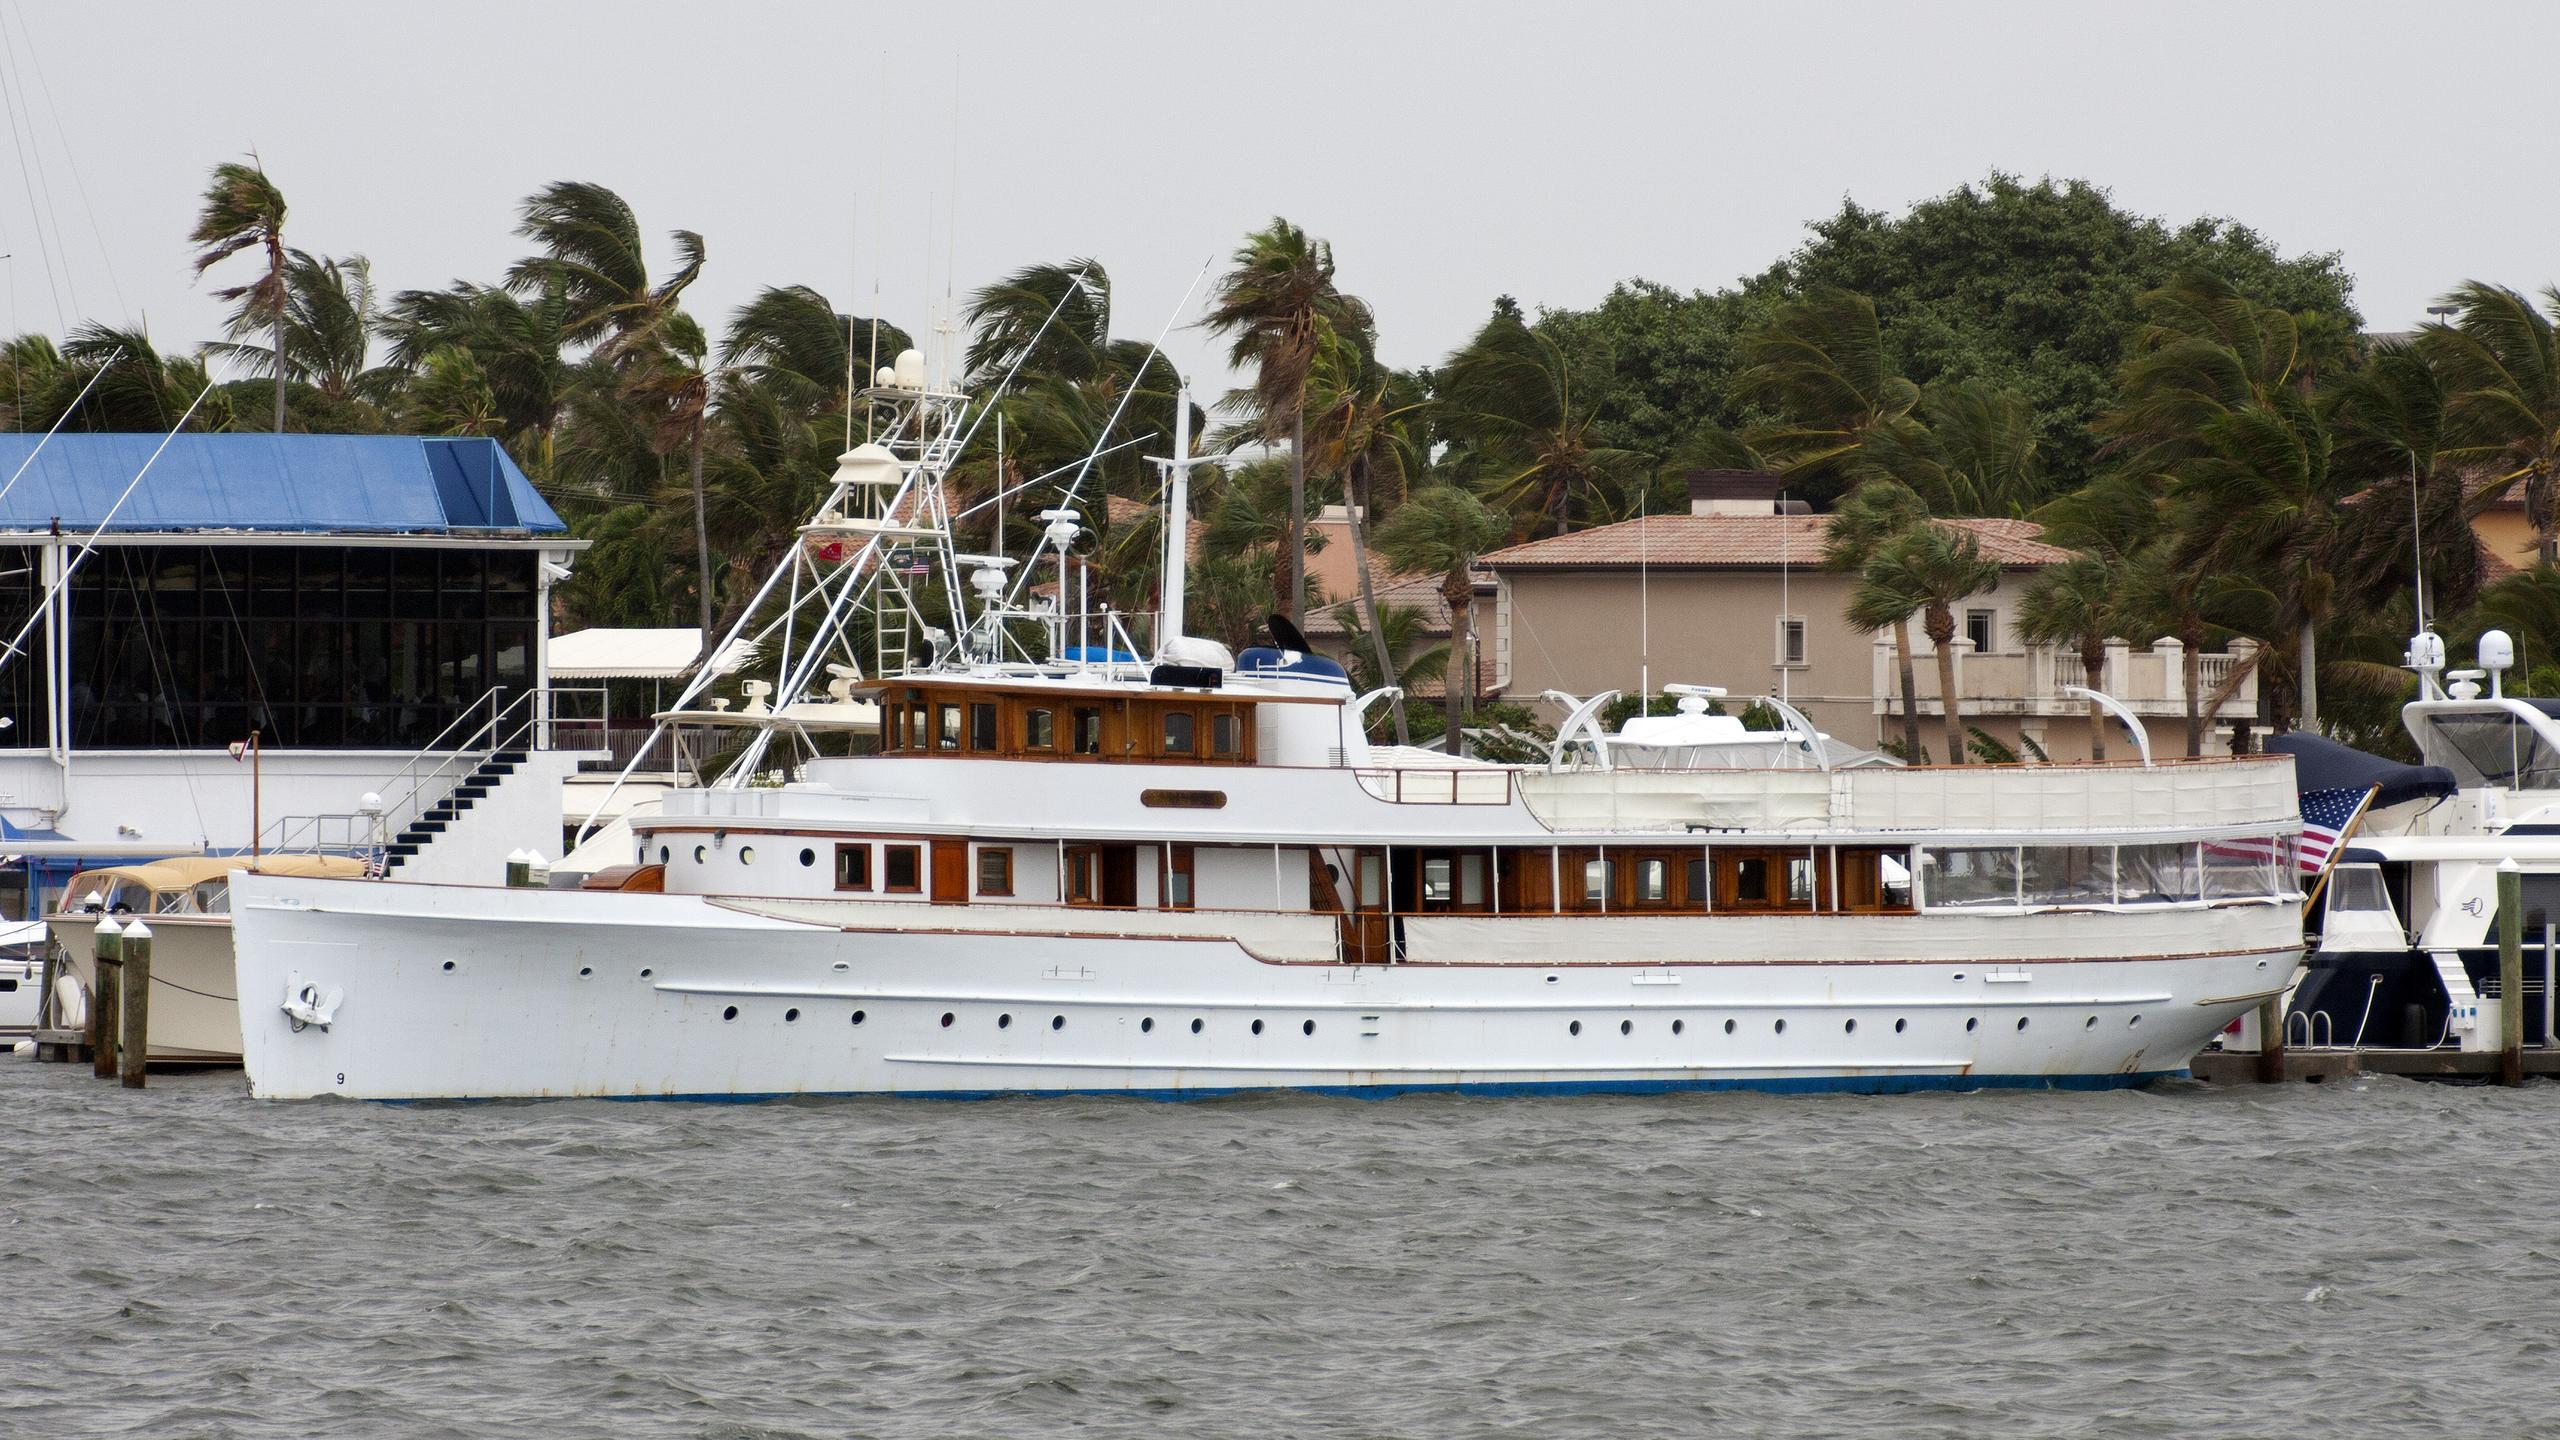 mariner-iii-yacht-exterior